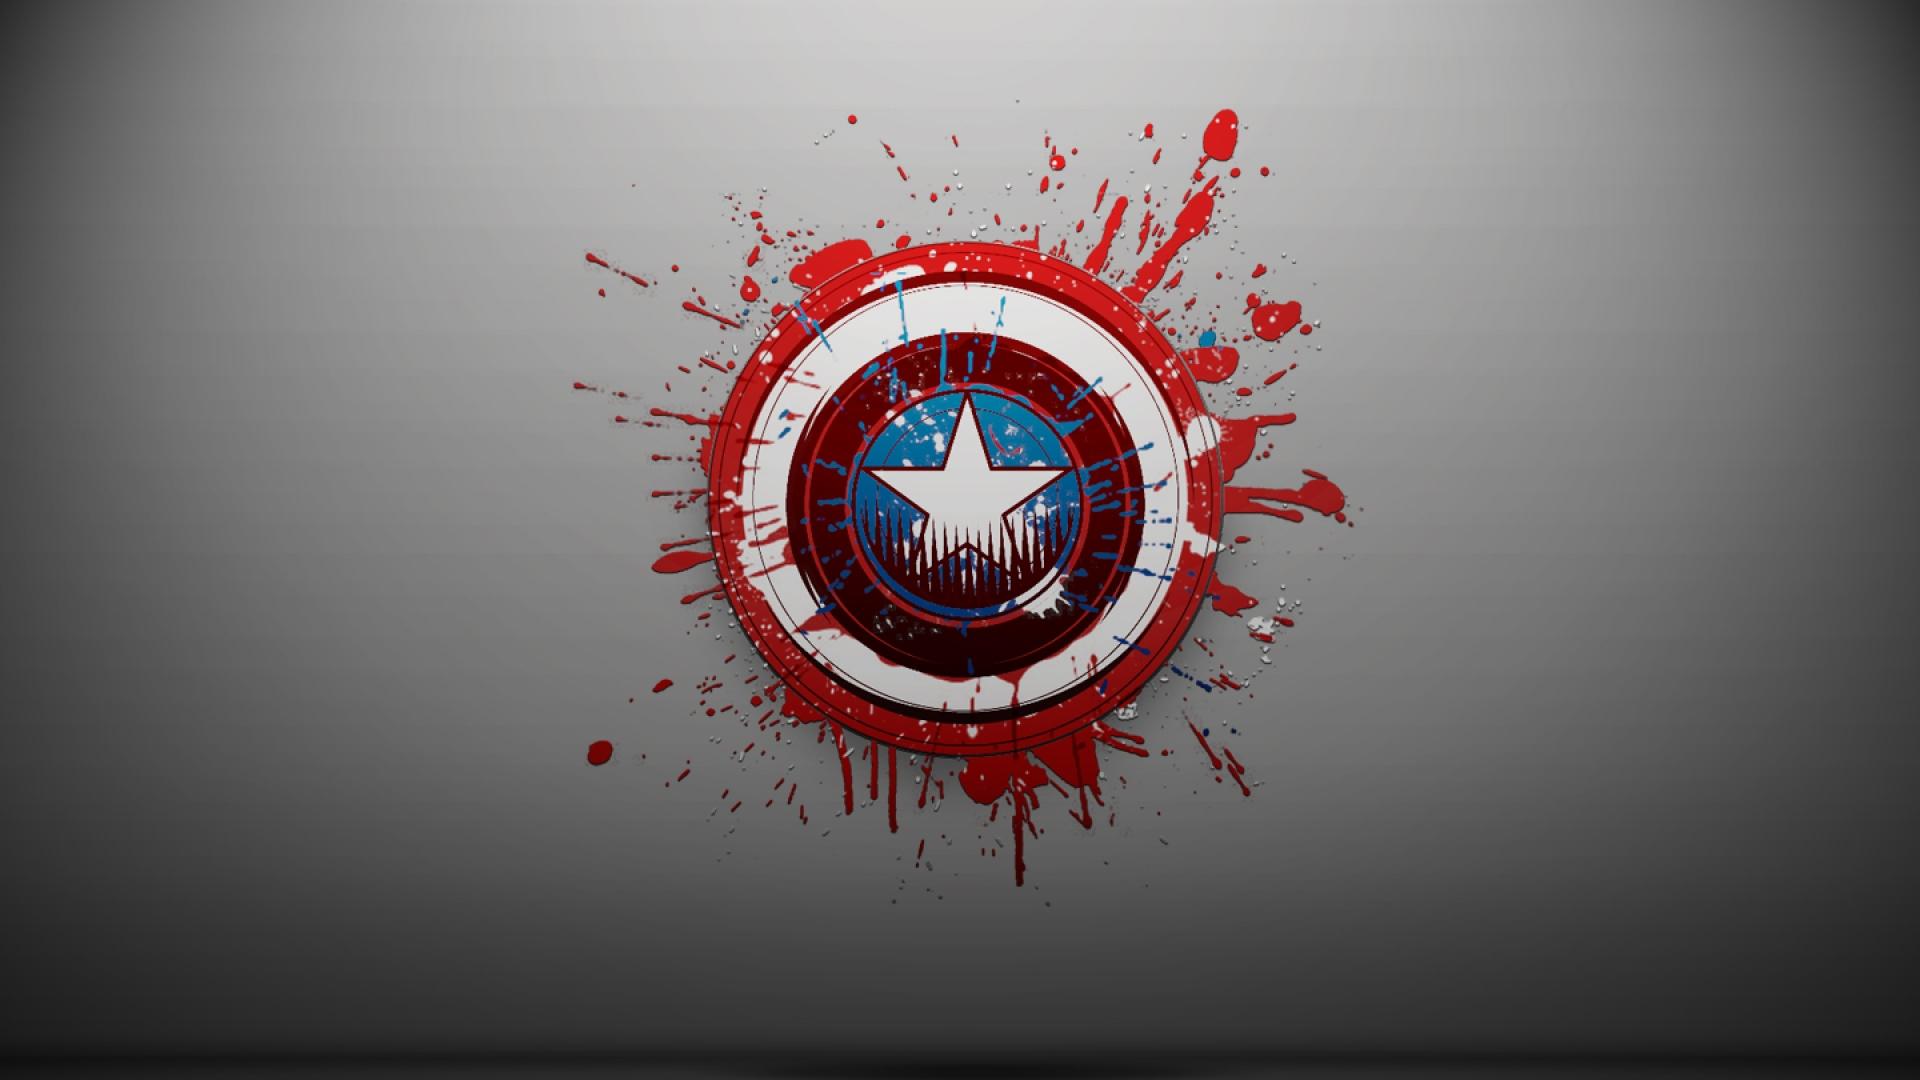 Download captain america logo wallpaper HD wallpaper 1920x1080